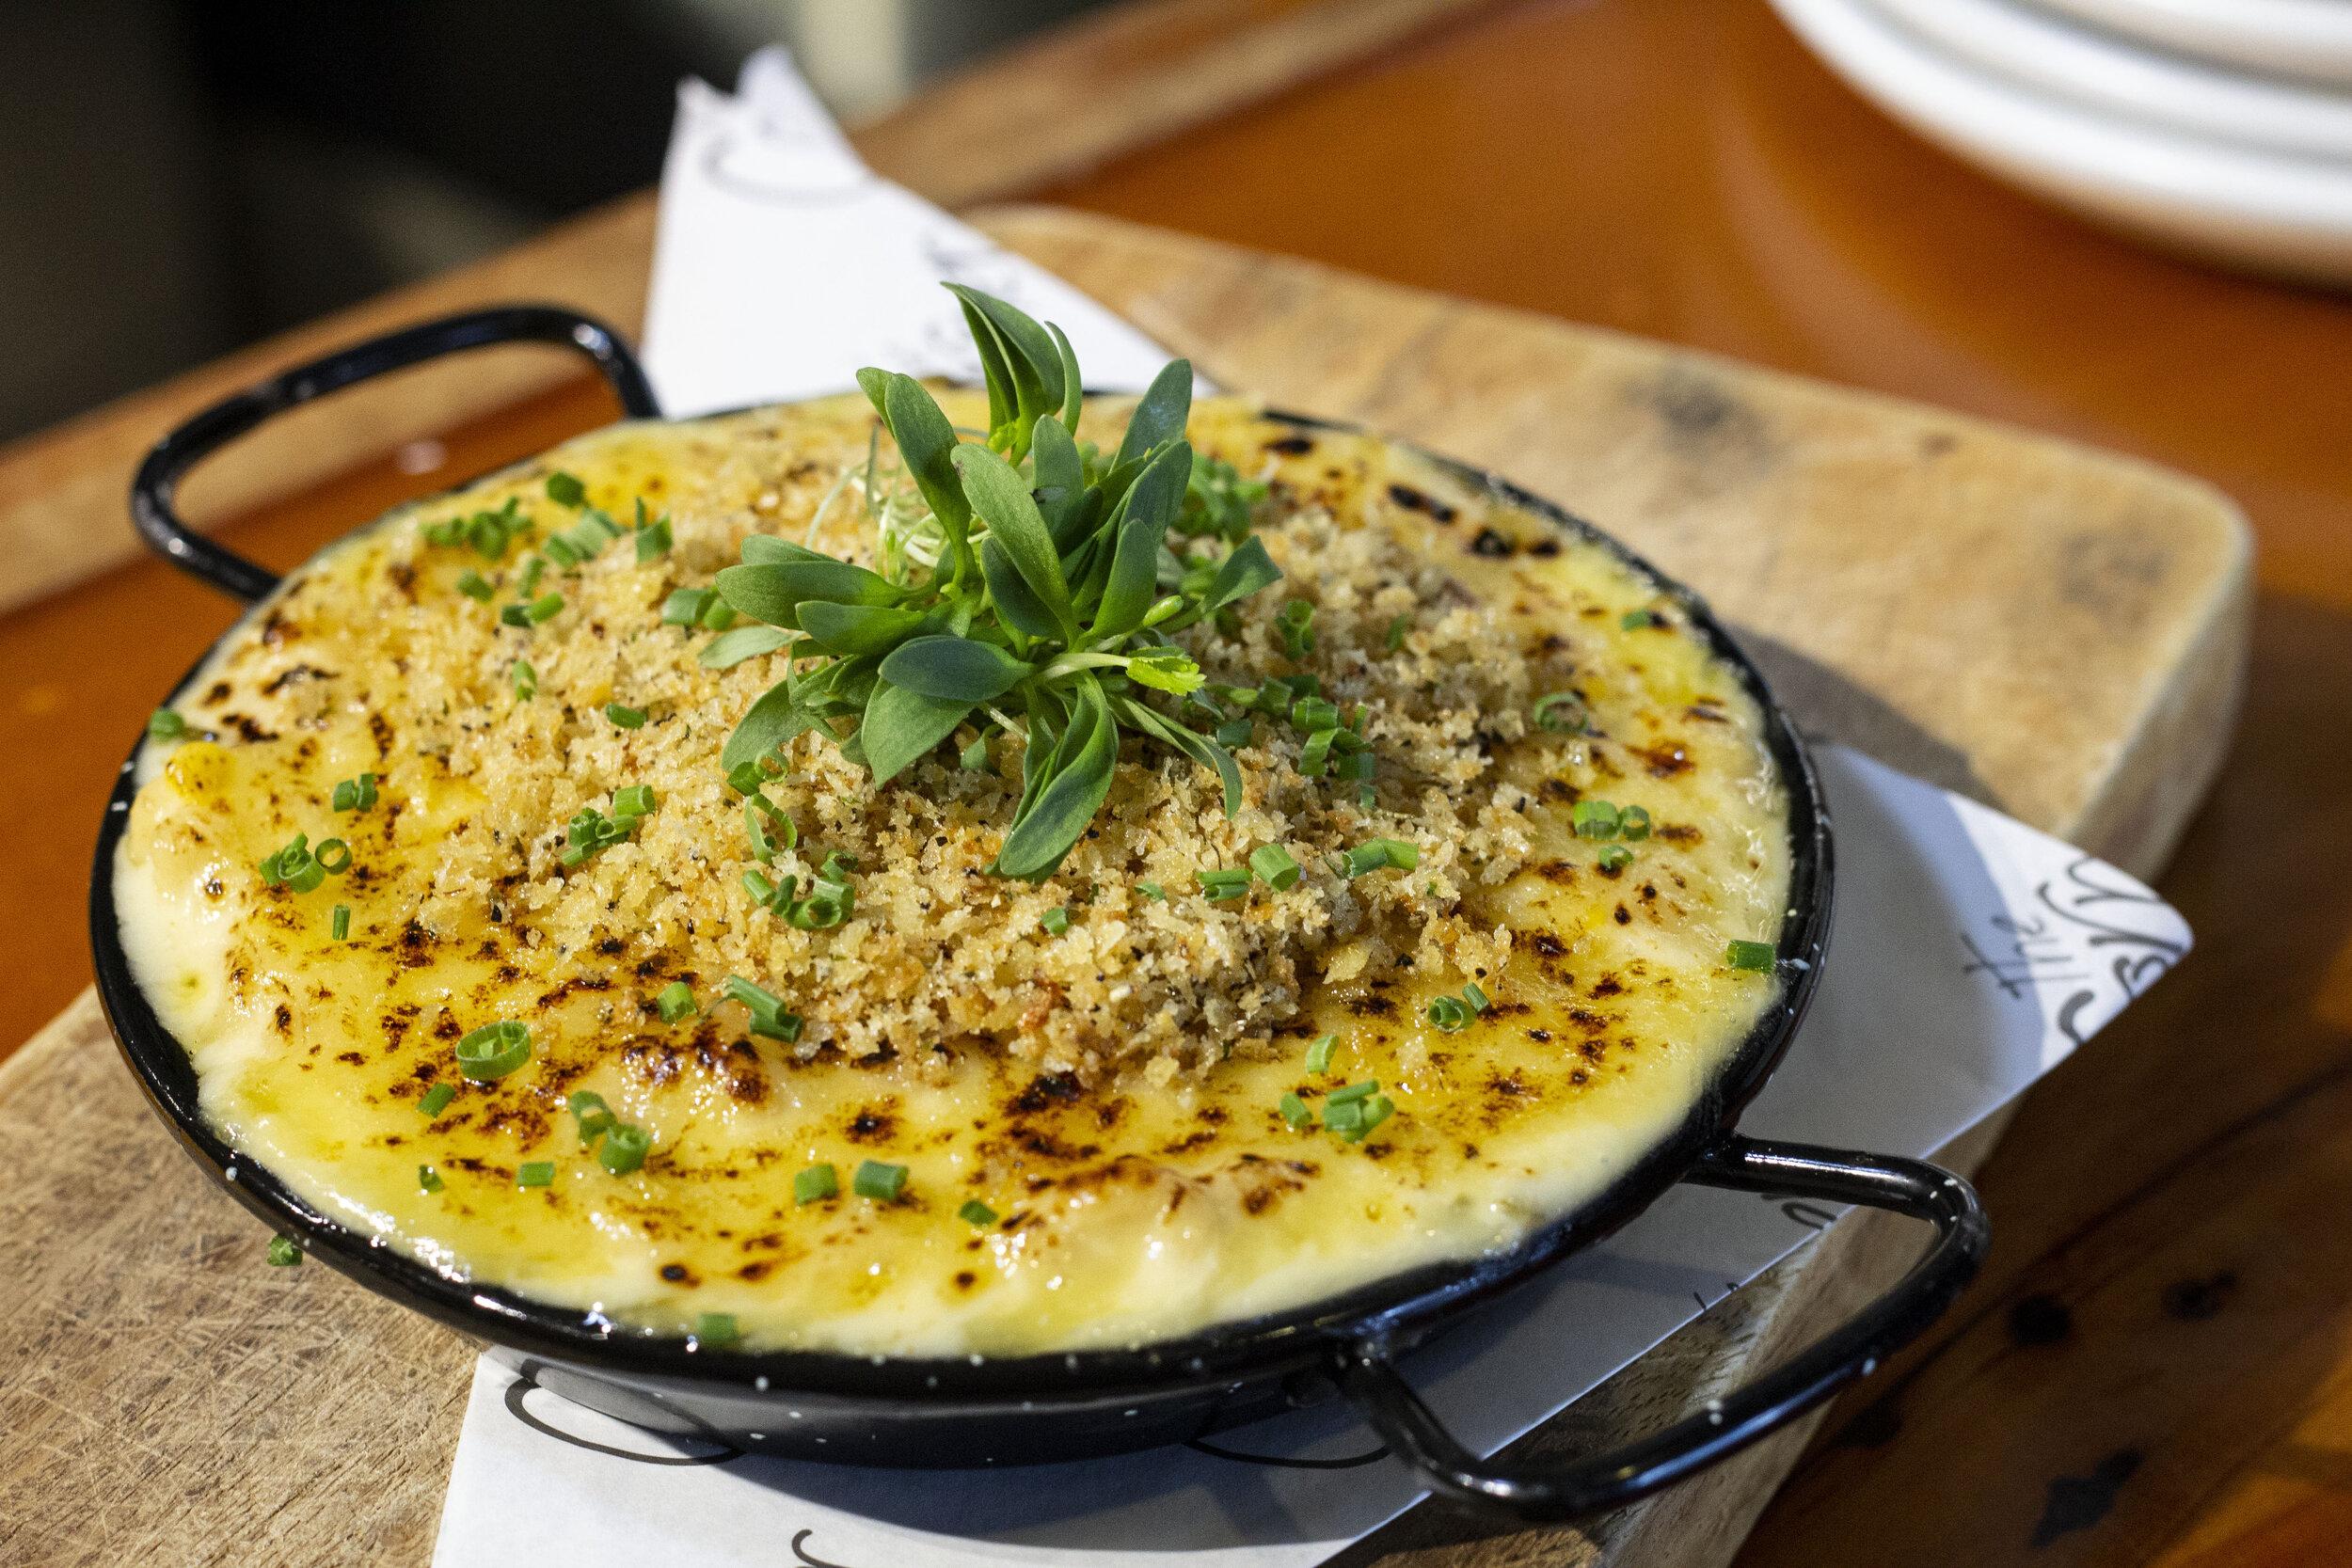 Sweetcorn & Jalapeno Mac 'n' Cheese